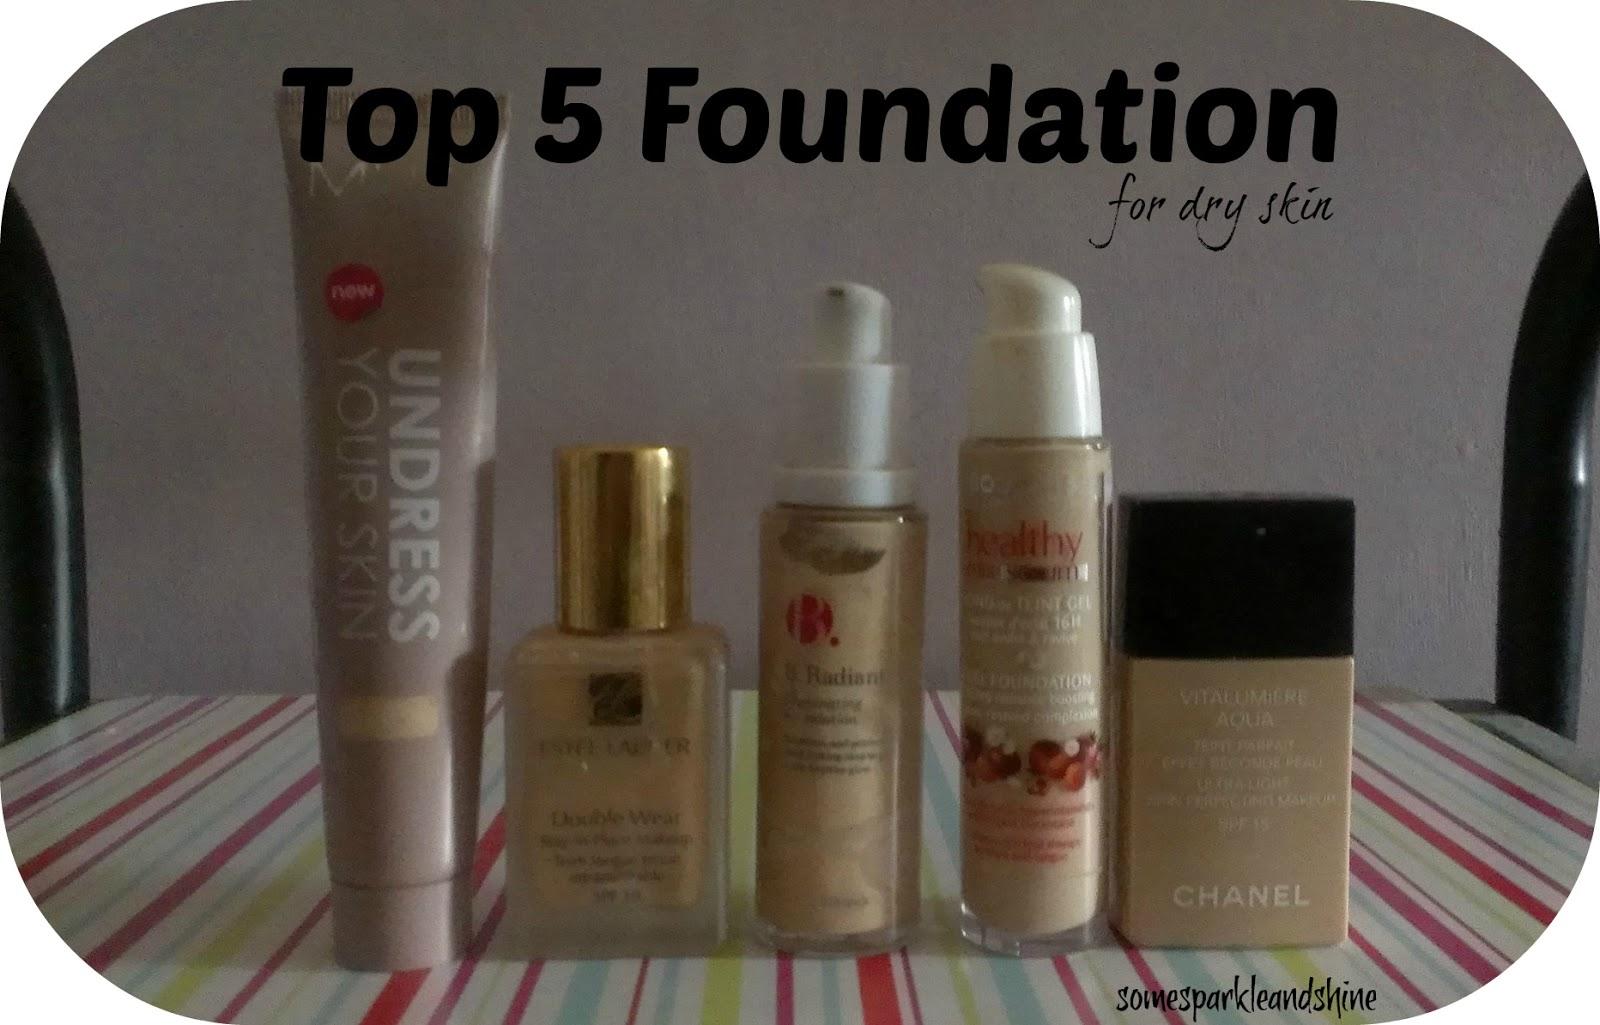 Dry skin foundation best foundation for older skin view original